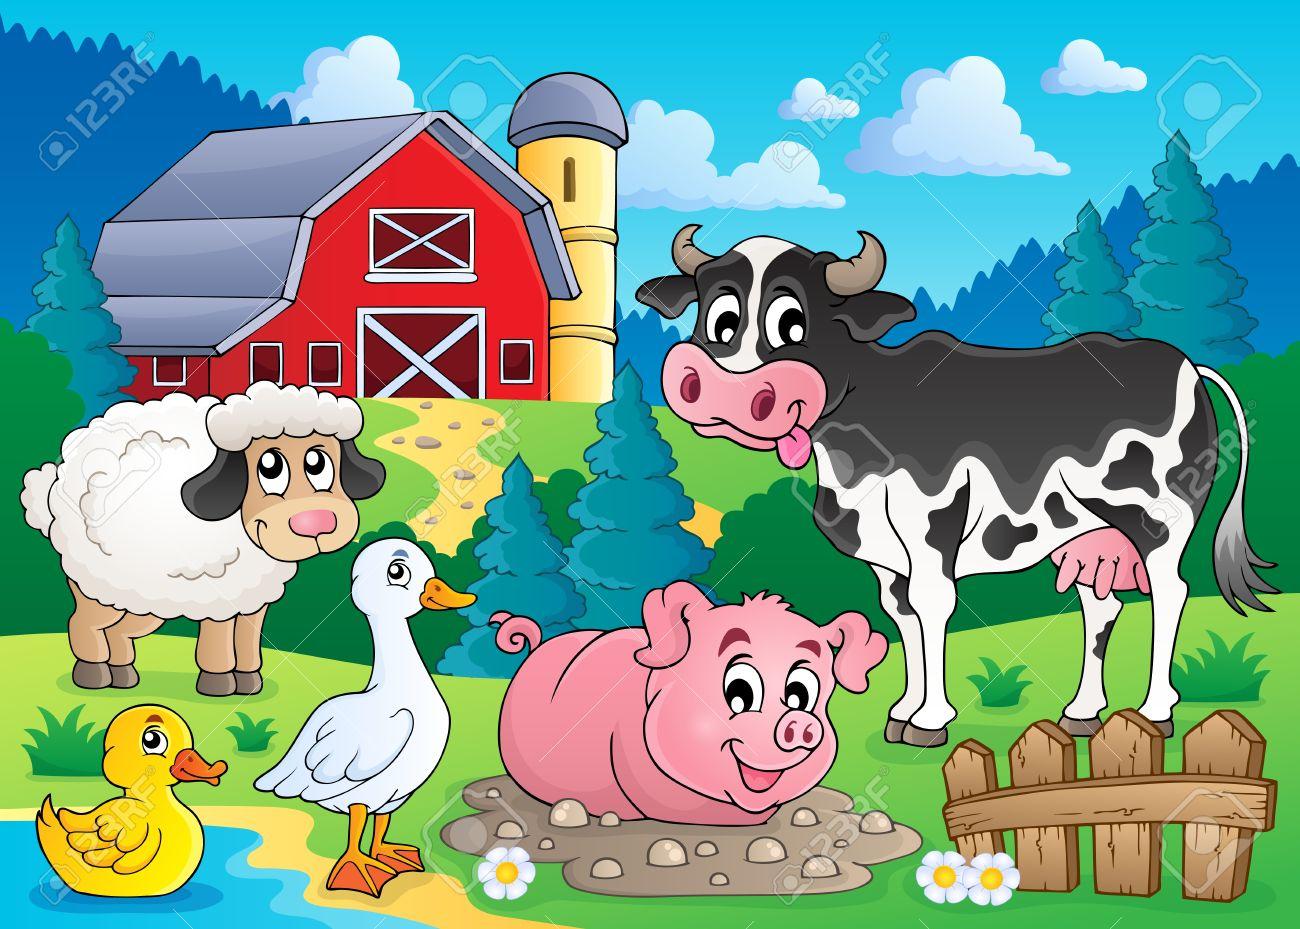 Farm animals theme image 3 - eps10 vector illustration Stock Vector - 22867211